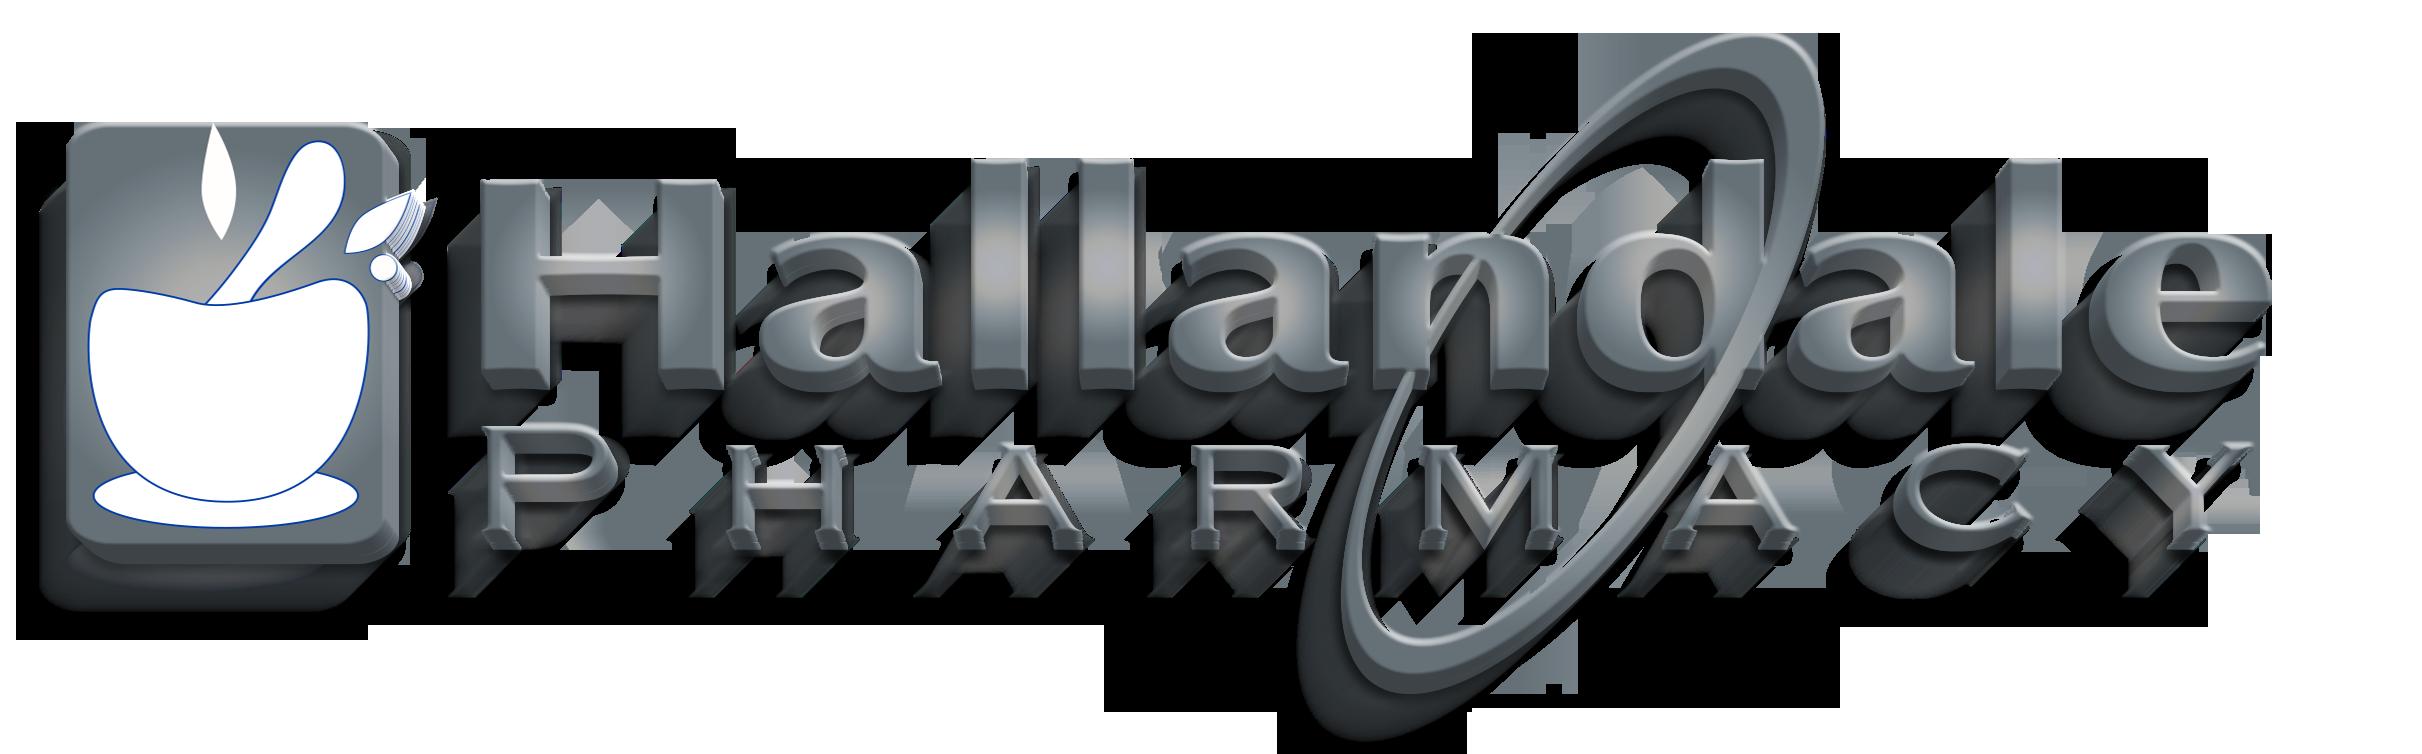 Hallandale Pharmacy